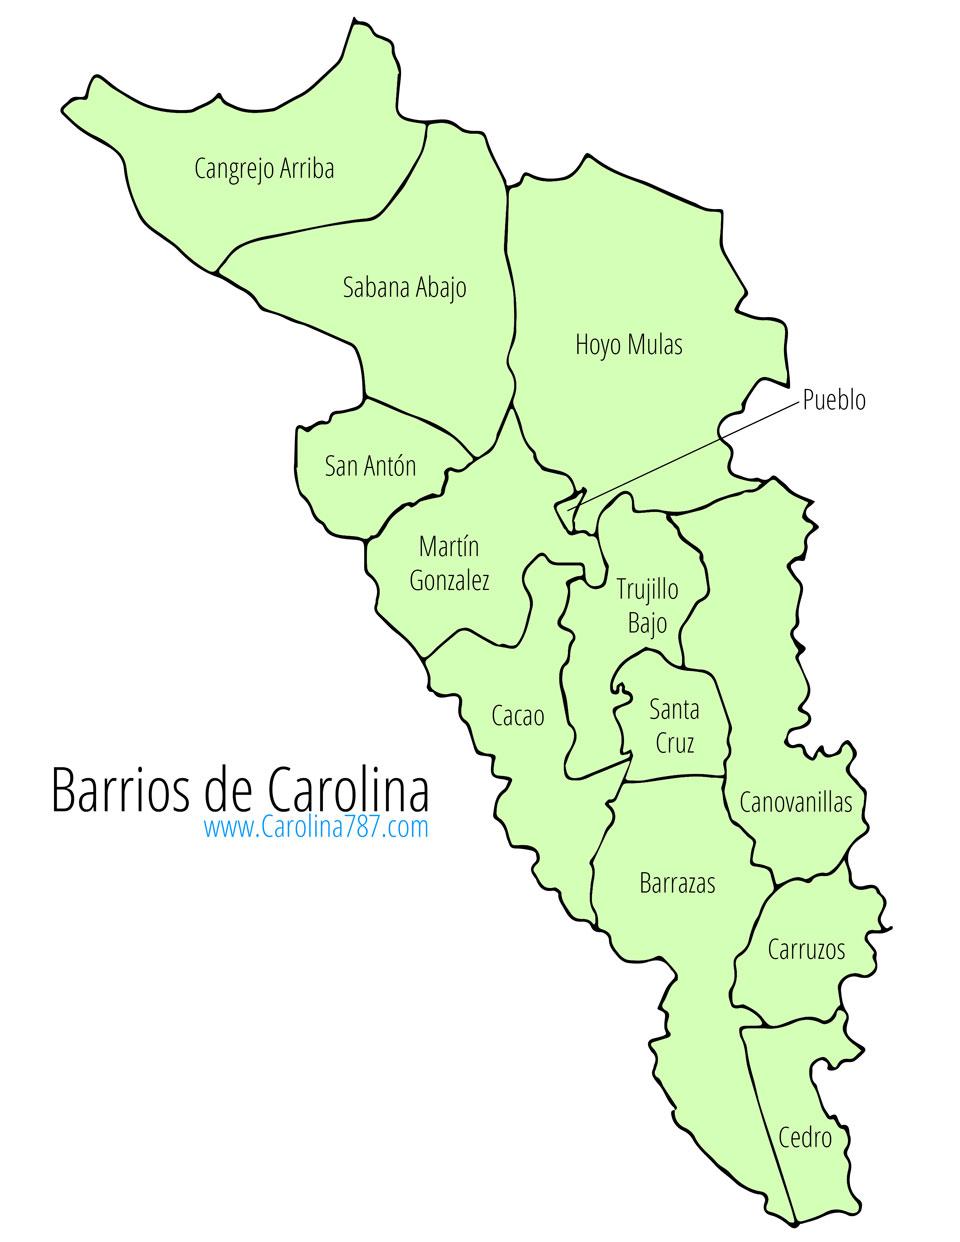 Barrios de Carolina, Puerto Rico.